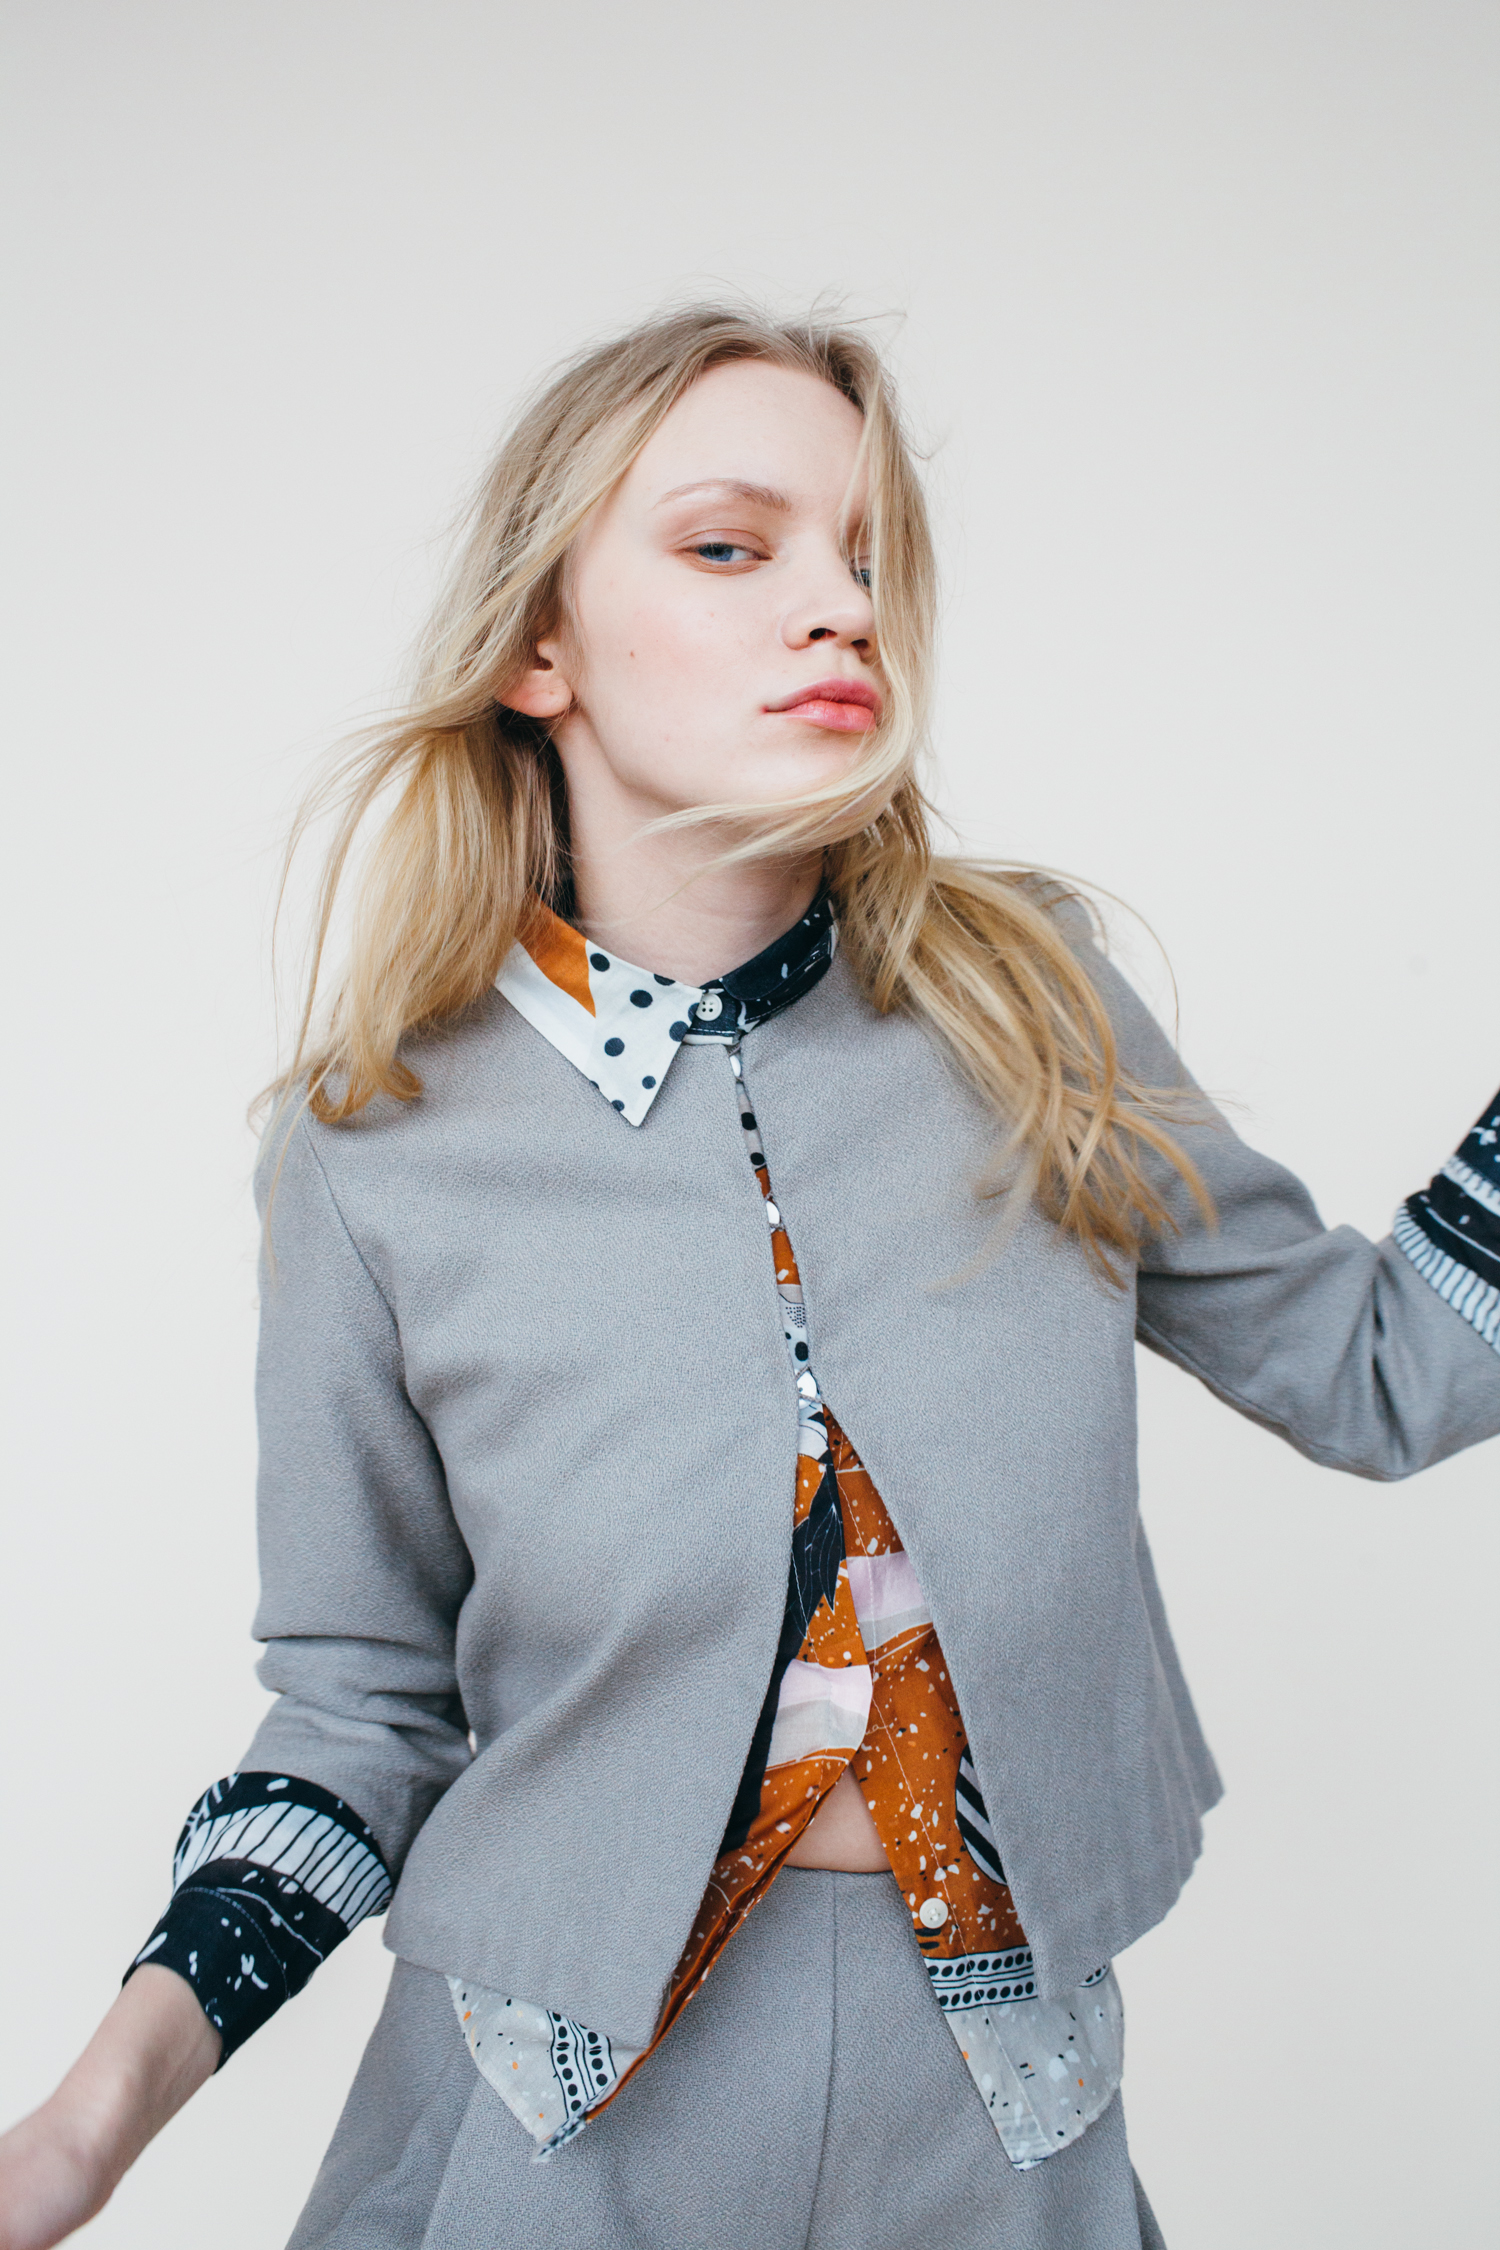 amber_byrne_mahoney_bullet_magazine_editorial_fashion_photography_024.jpg